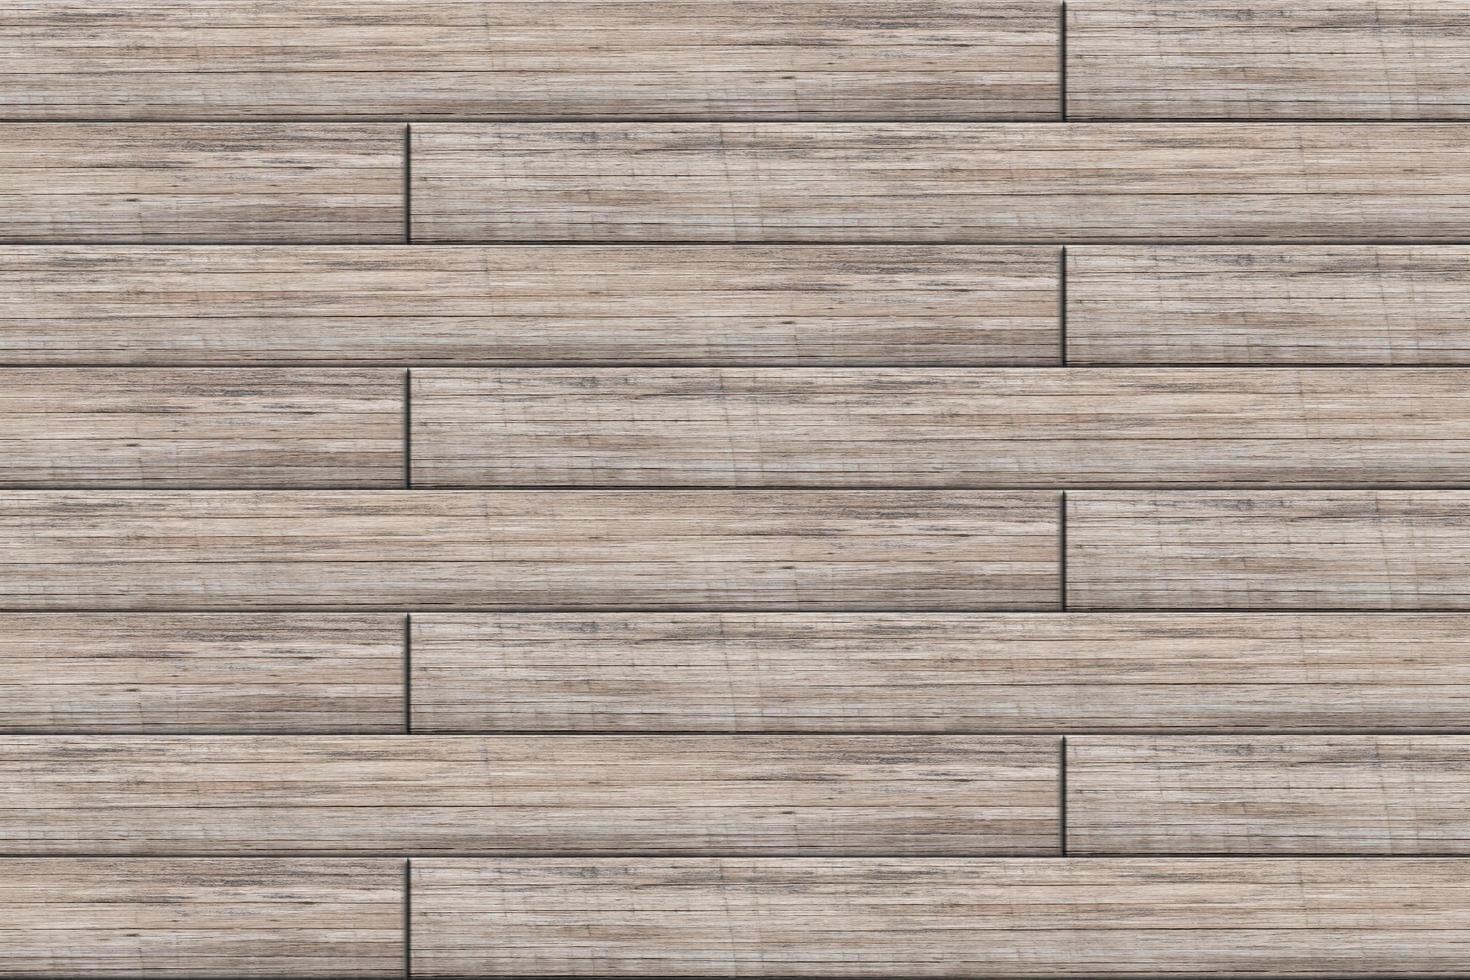 Scenes  Wood Floor Plates photo